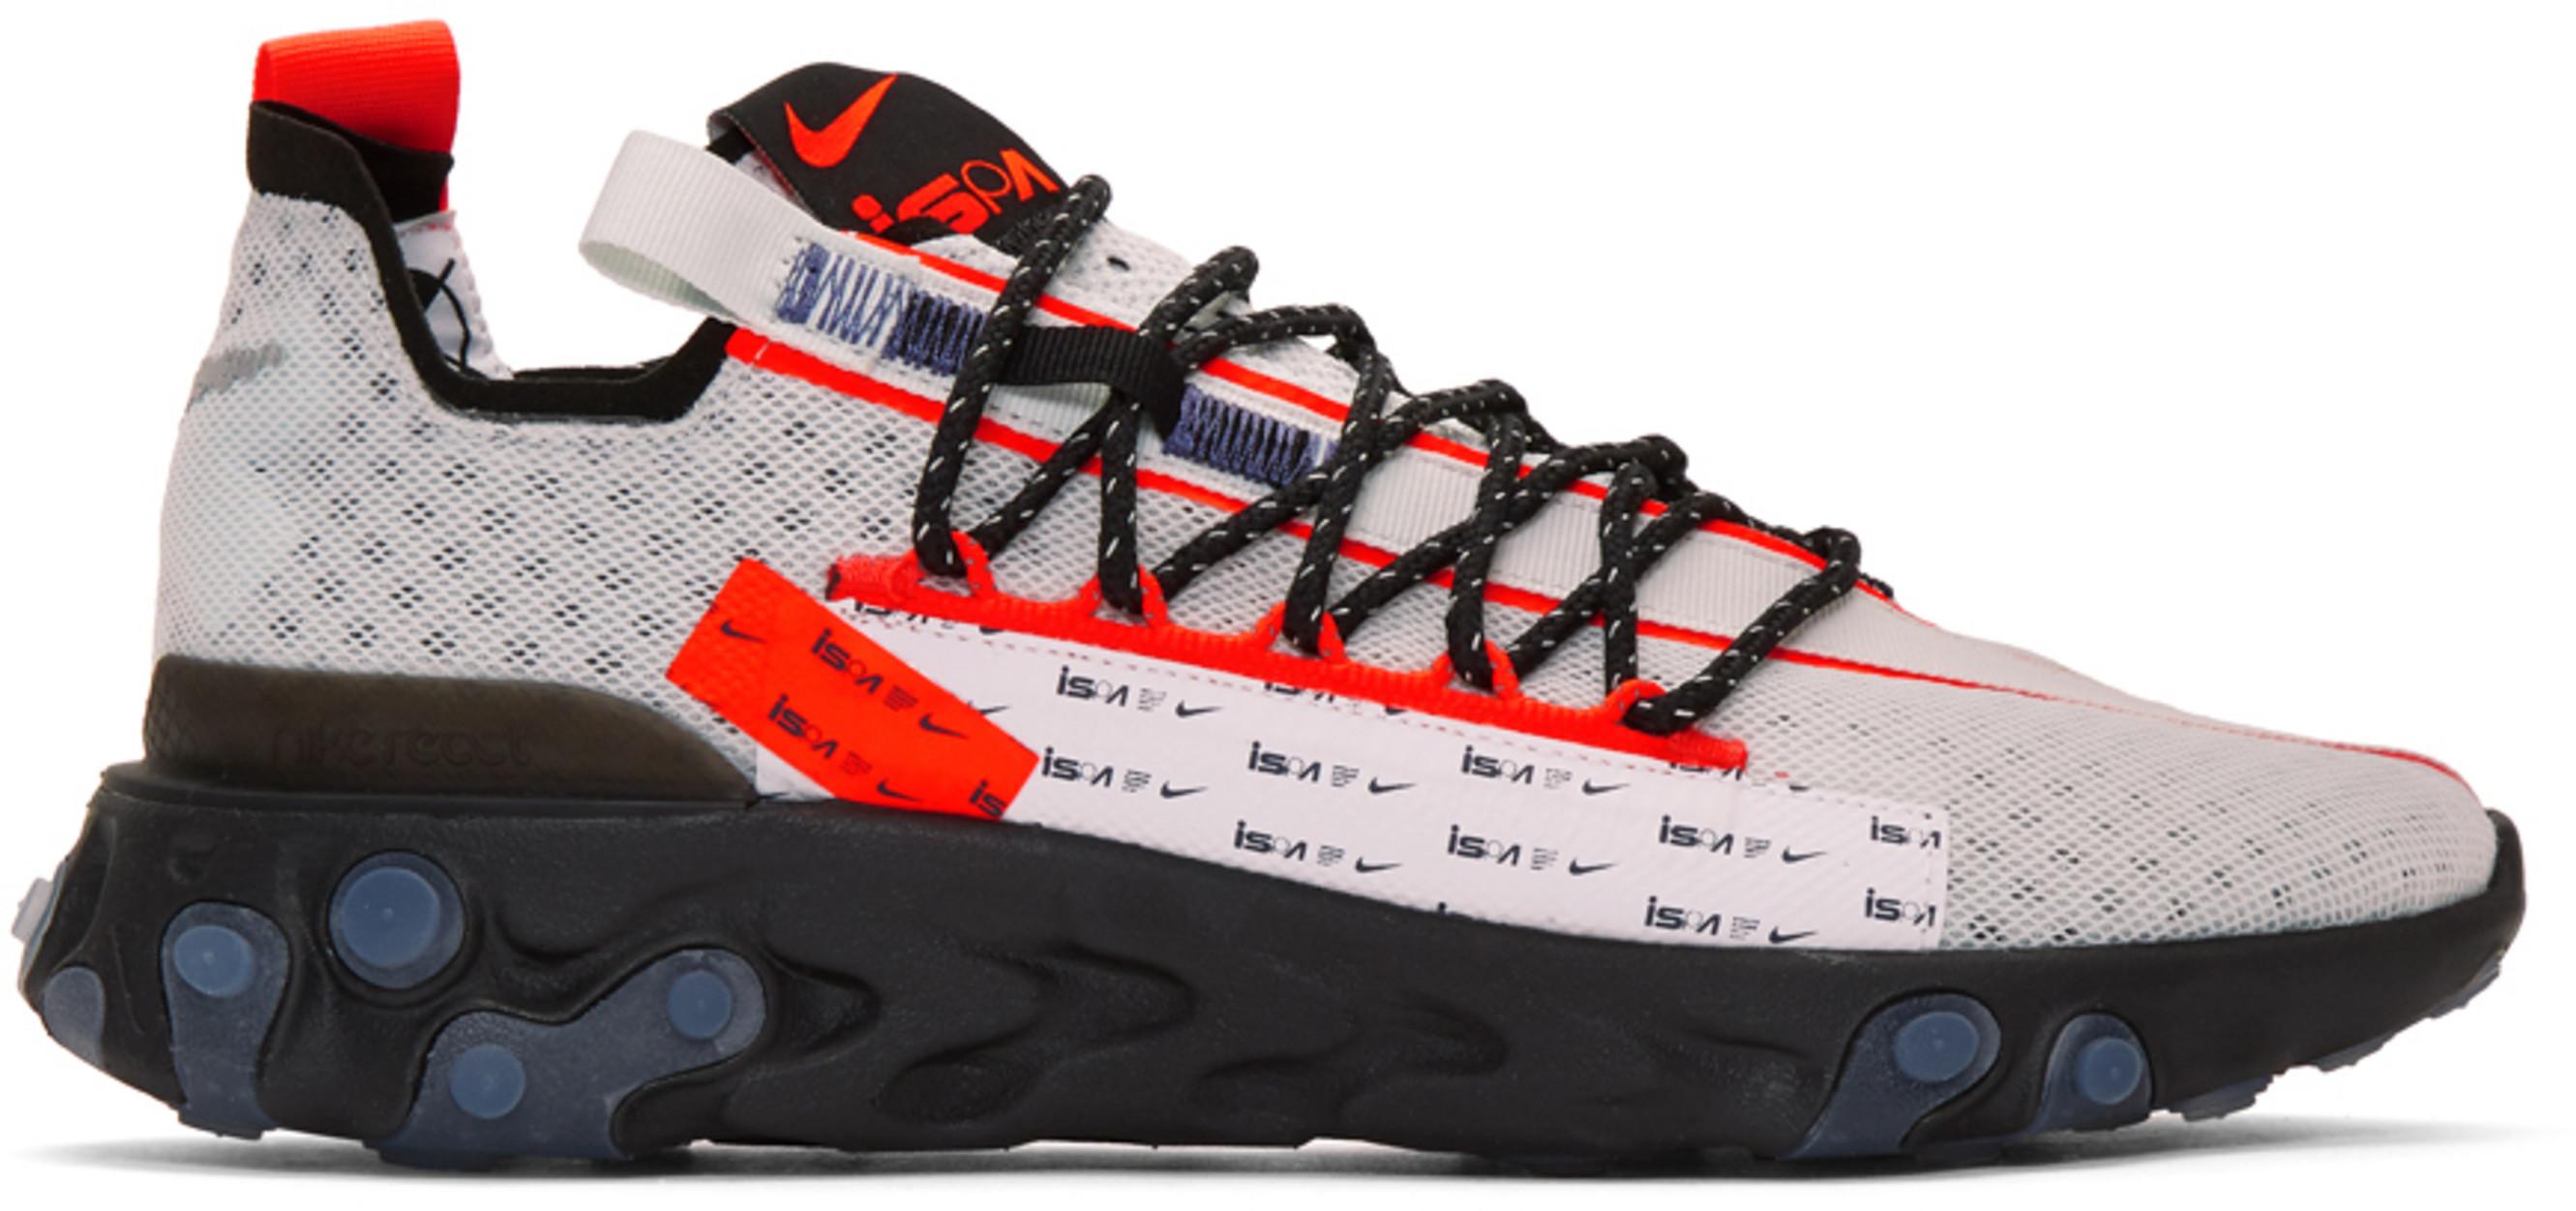 Black & Grey React iSPA Sneakers